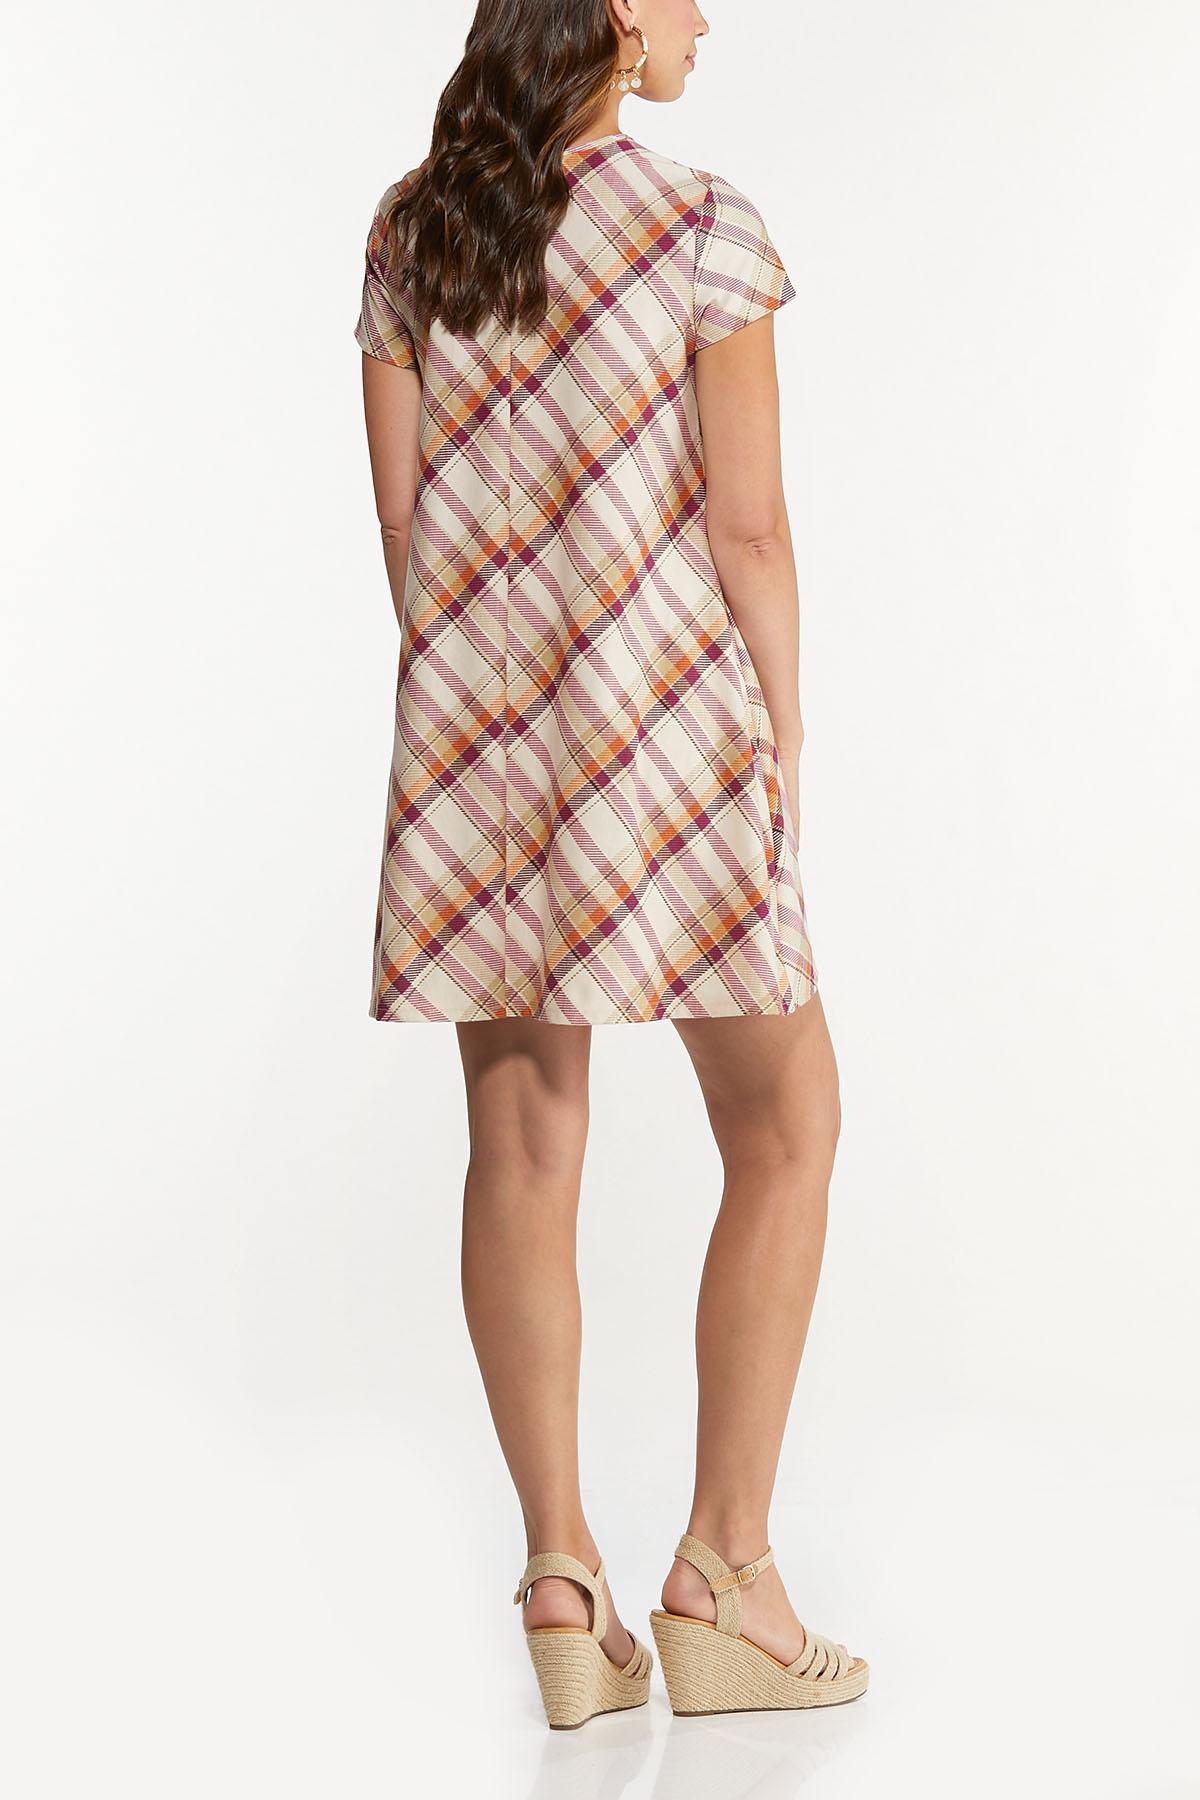 Ombre Plaid Swing Dress (Item #44729305)